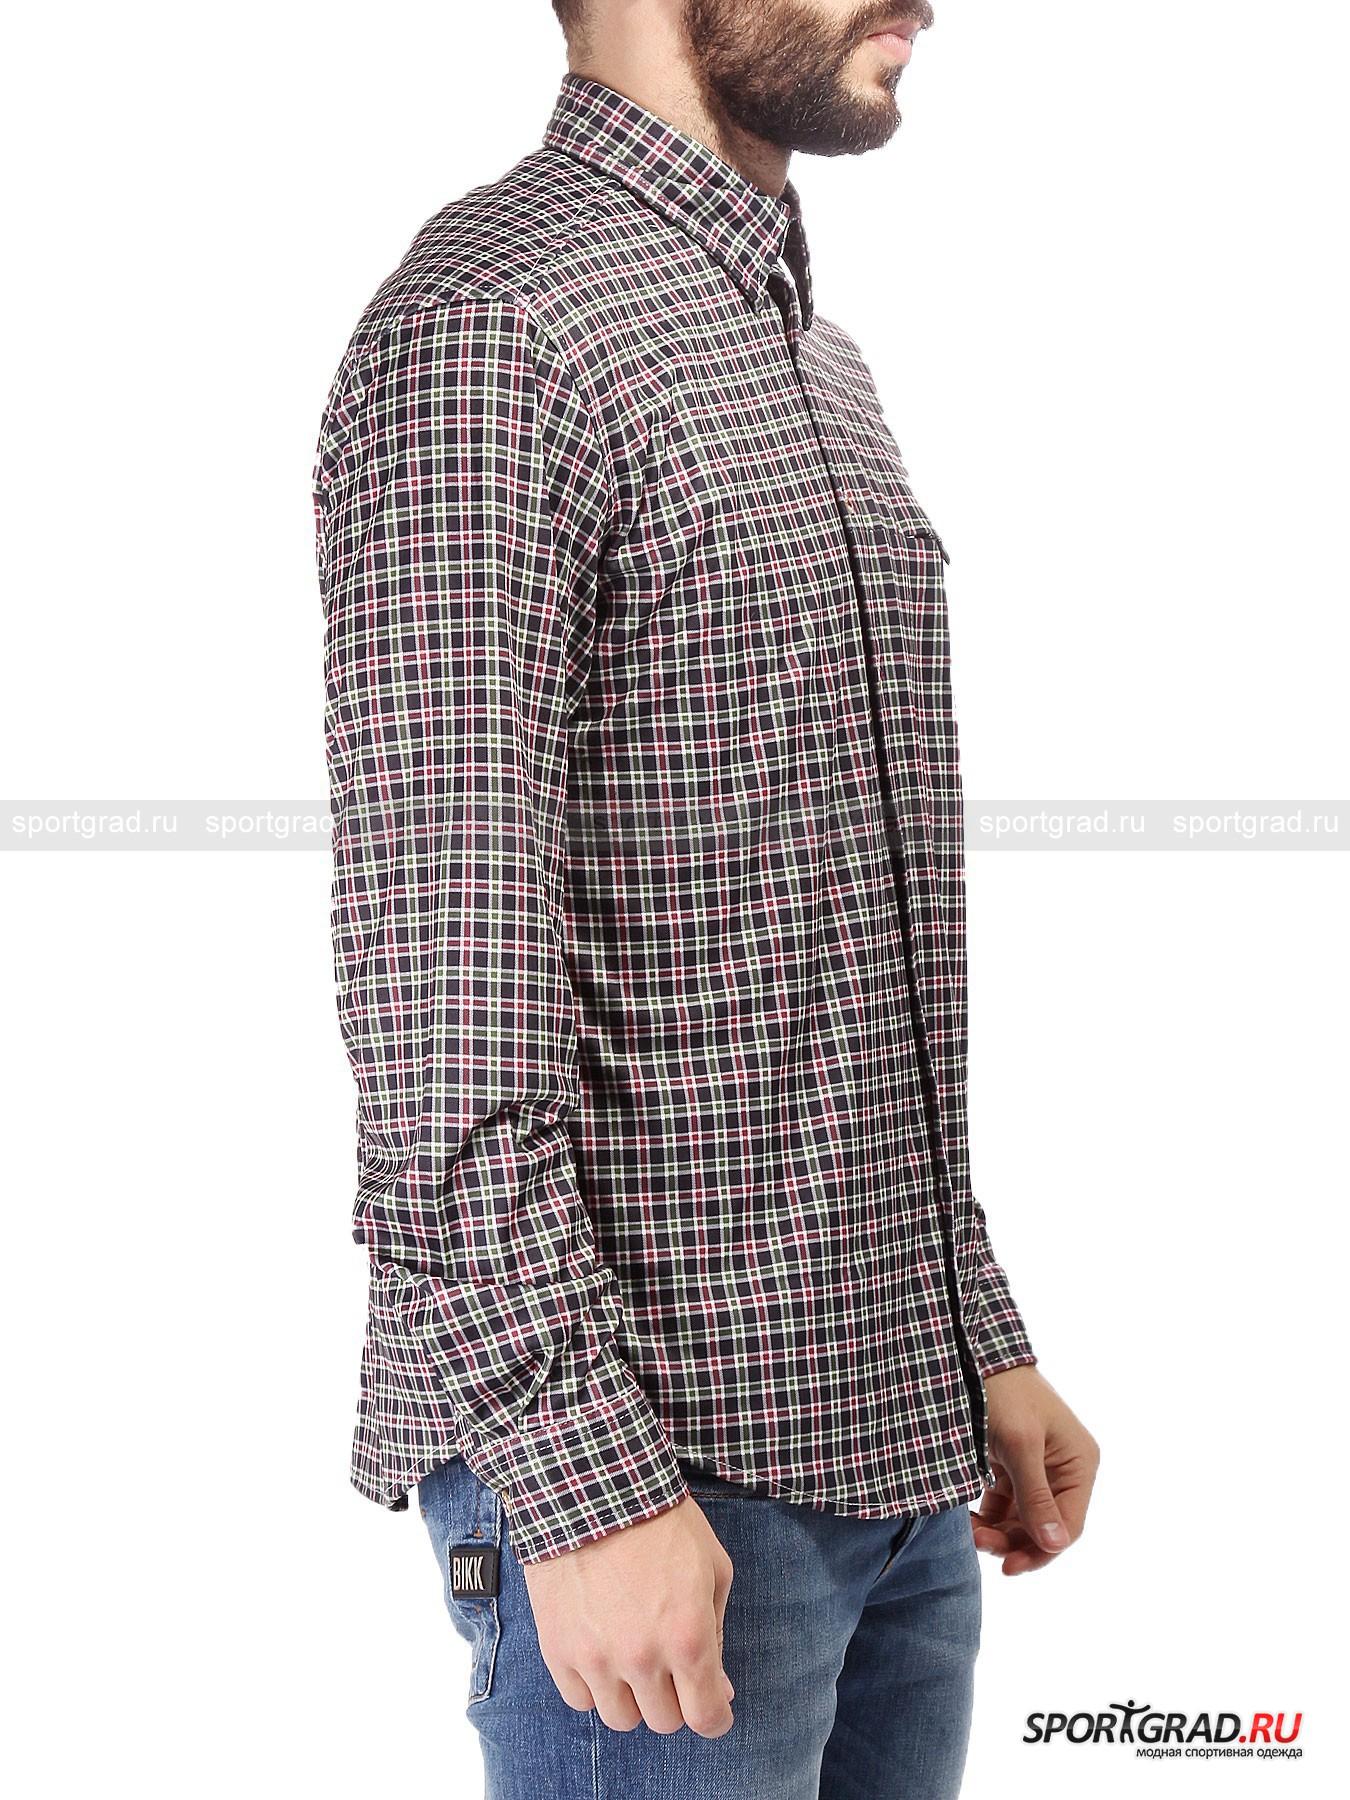 Мужская рубашка CMP Dry Function Shirt от Спортград